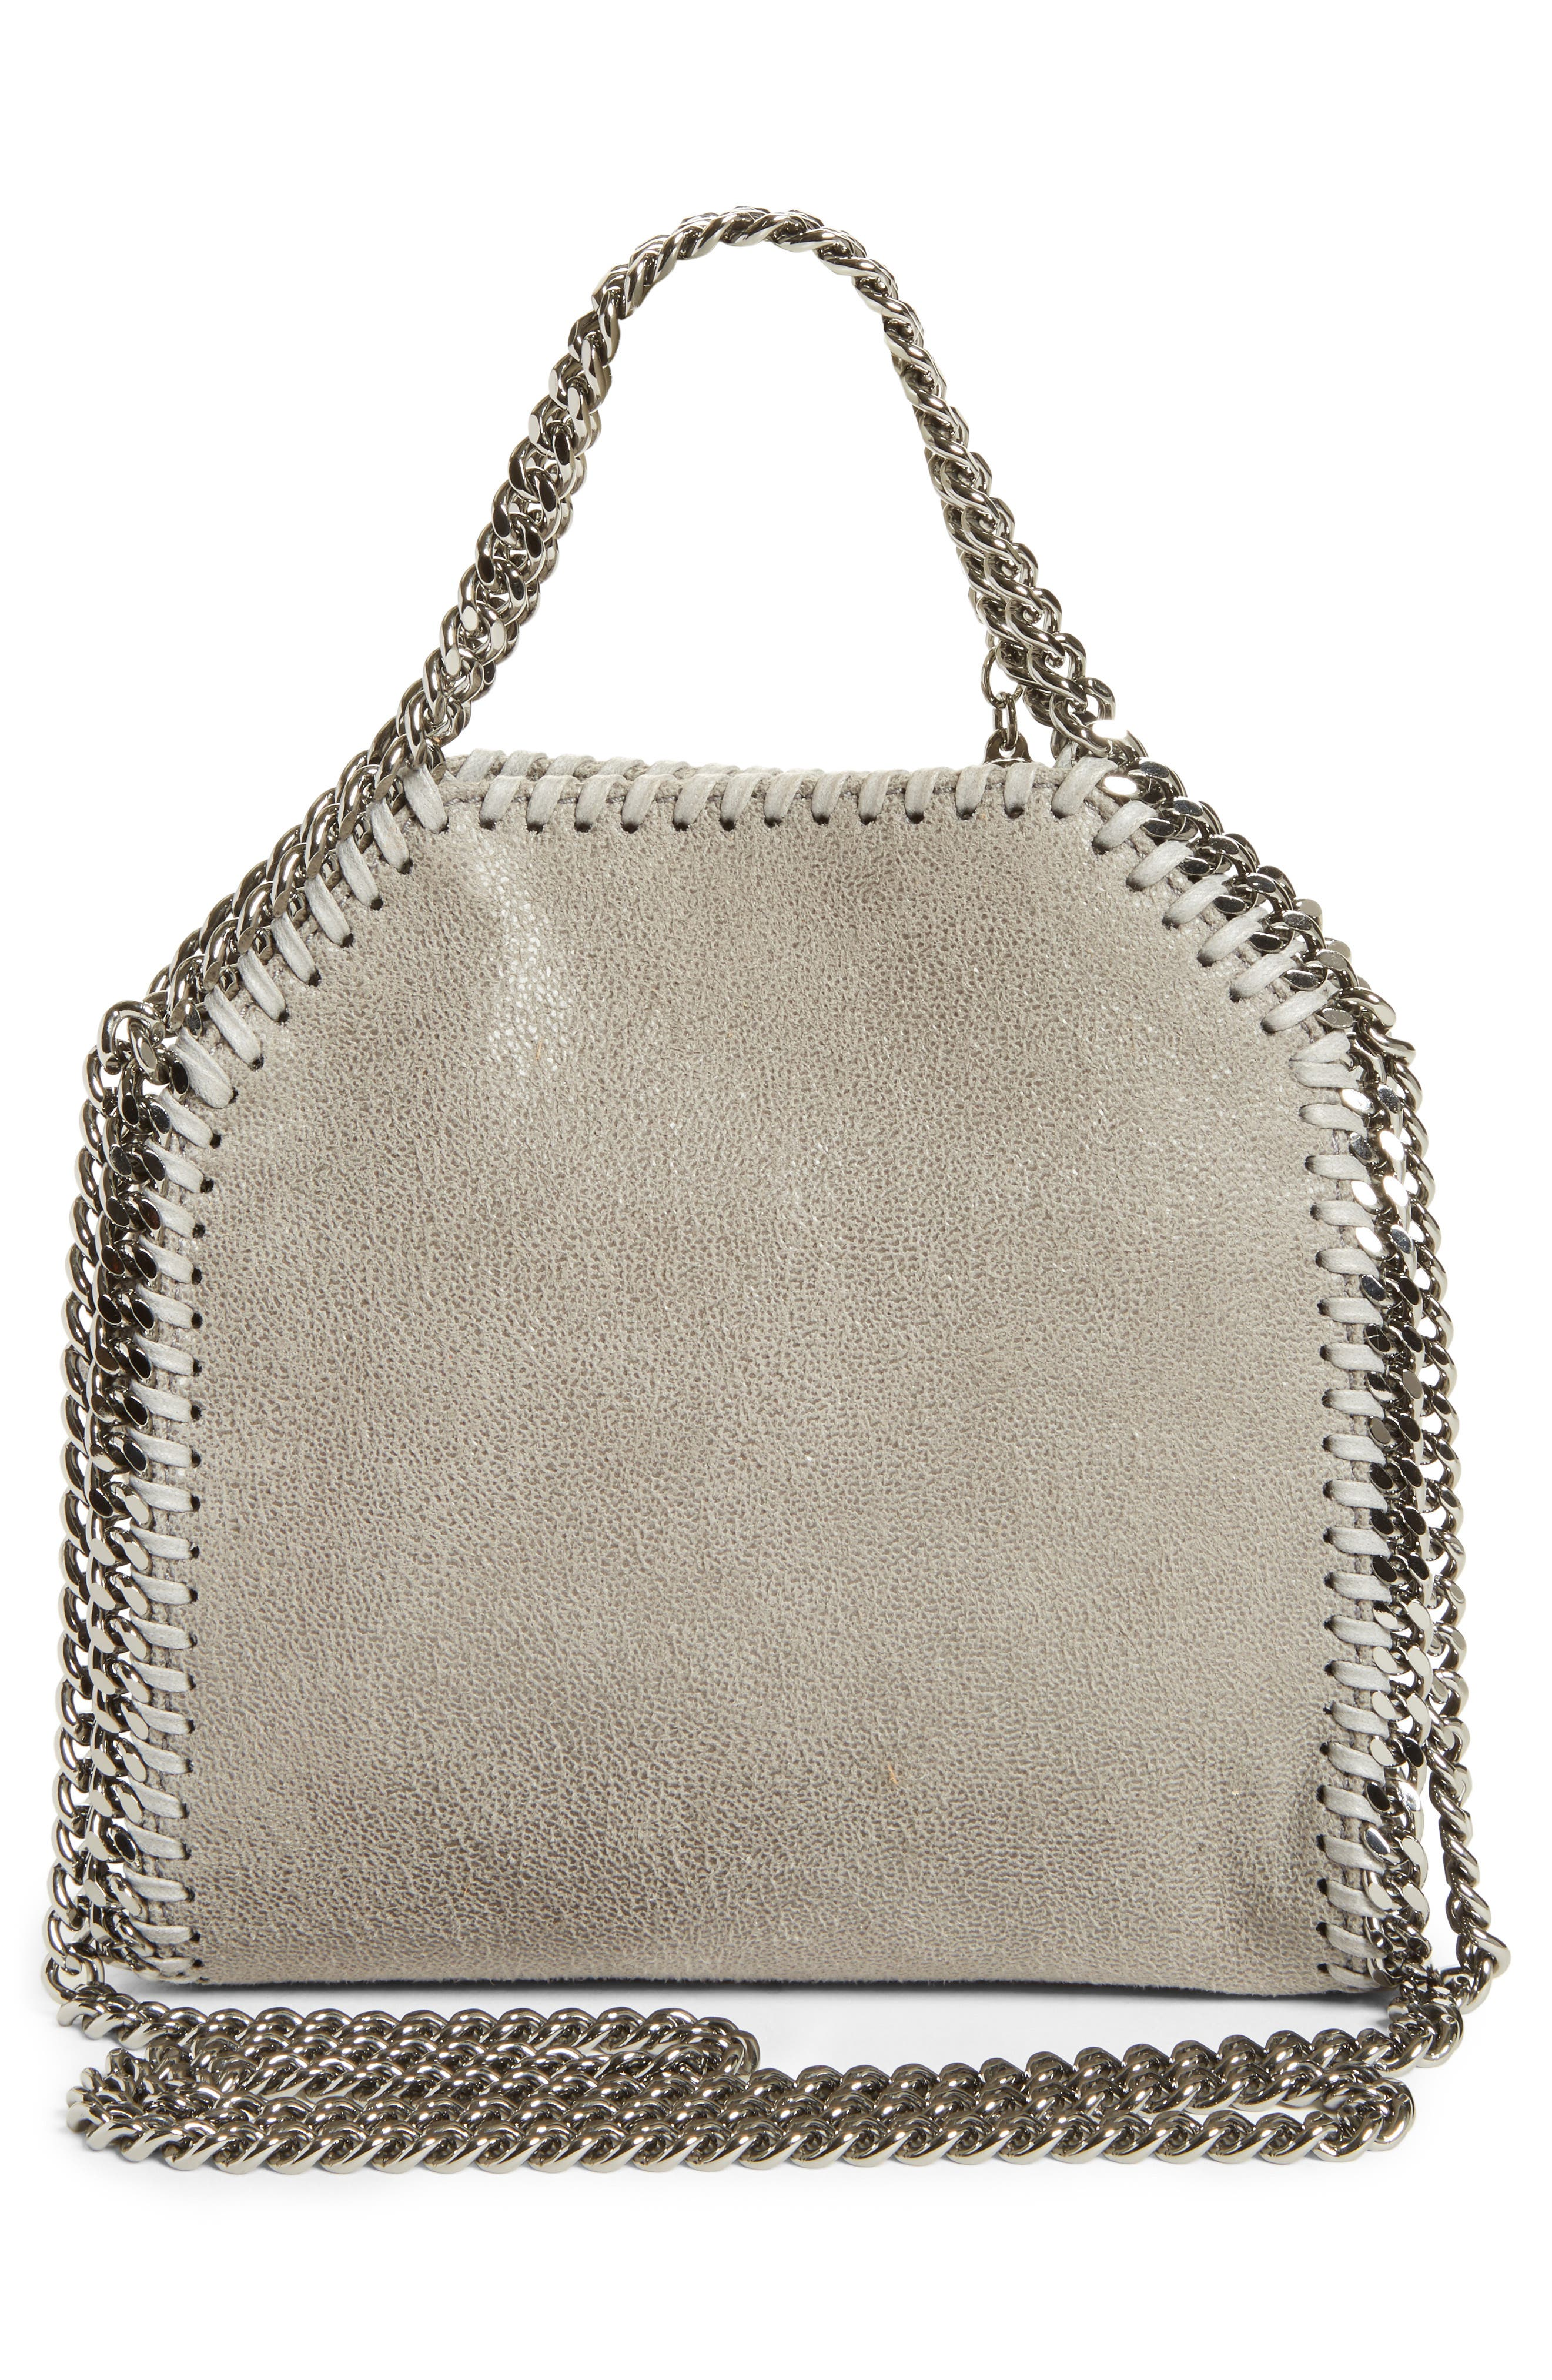 'Tiny Falabella' Faux Leather Crossbody Bag,                             Alternate thumbnail 3, color,                             LIGHT GREY